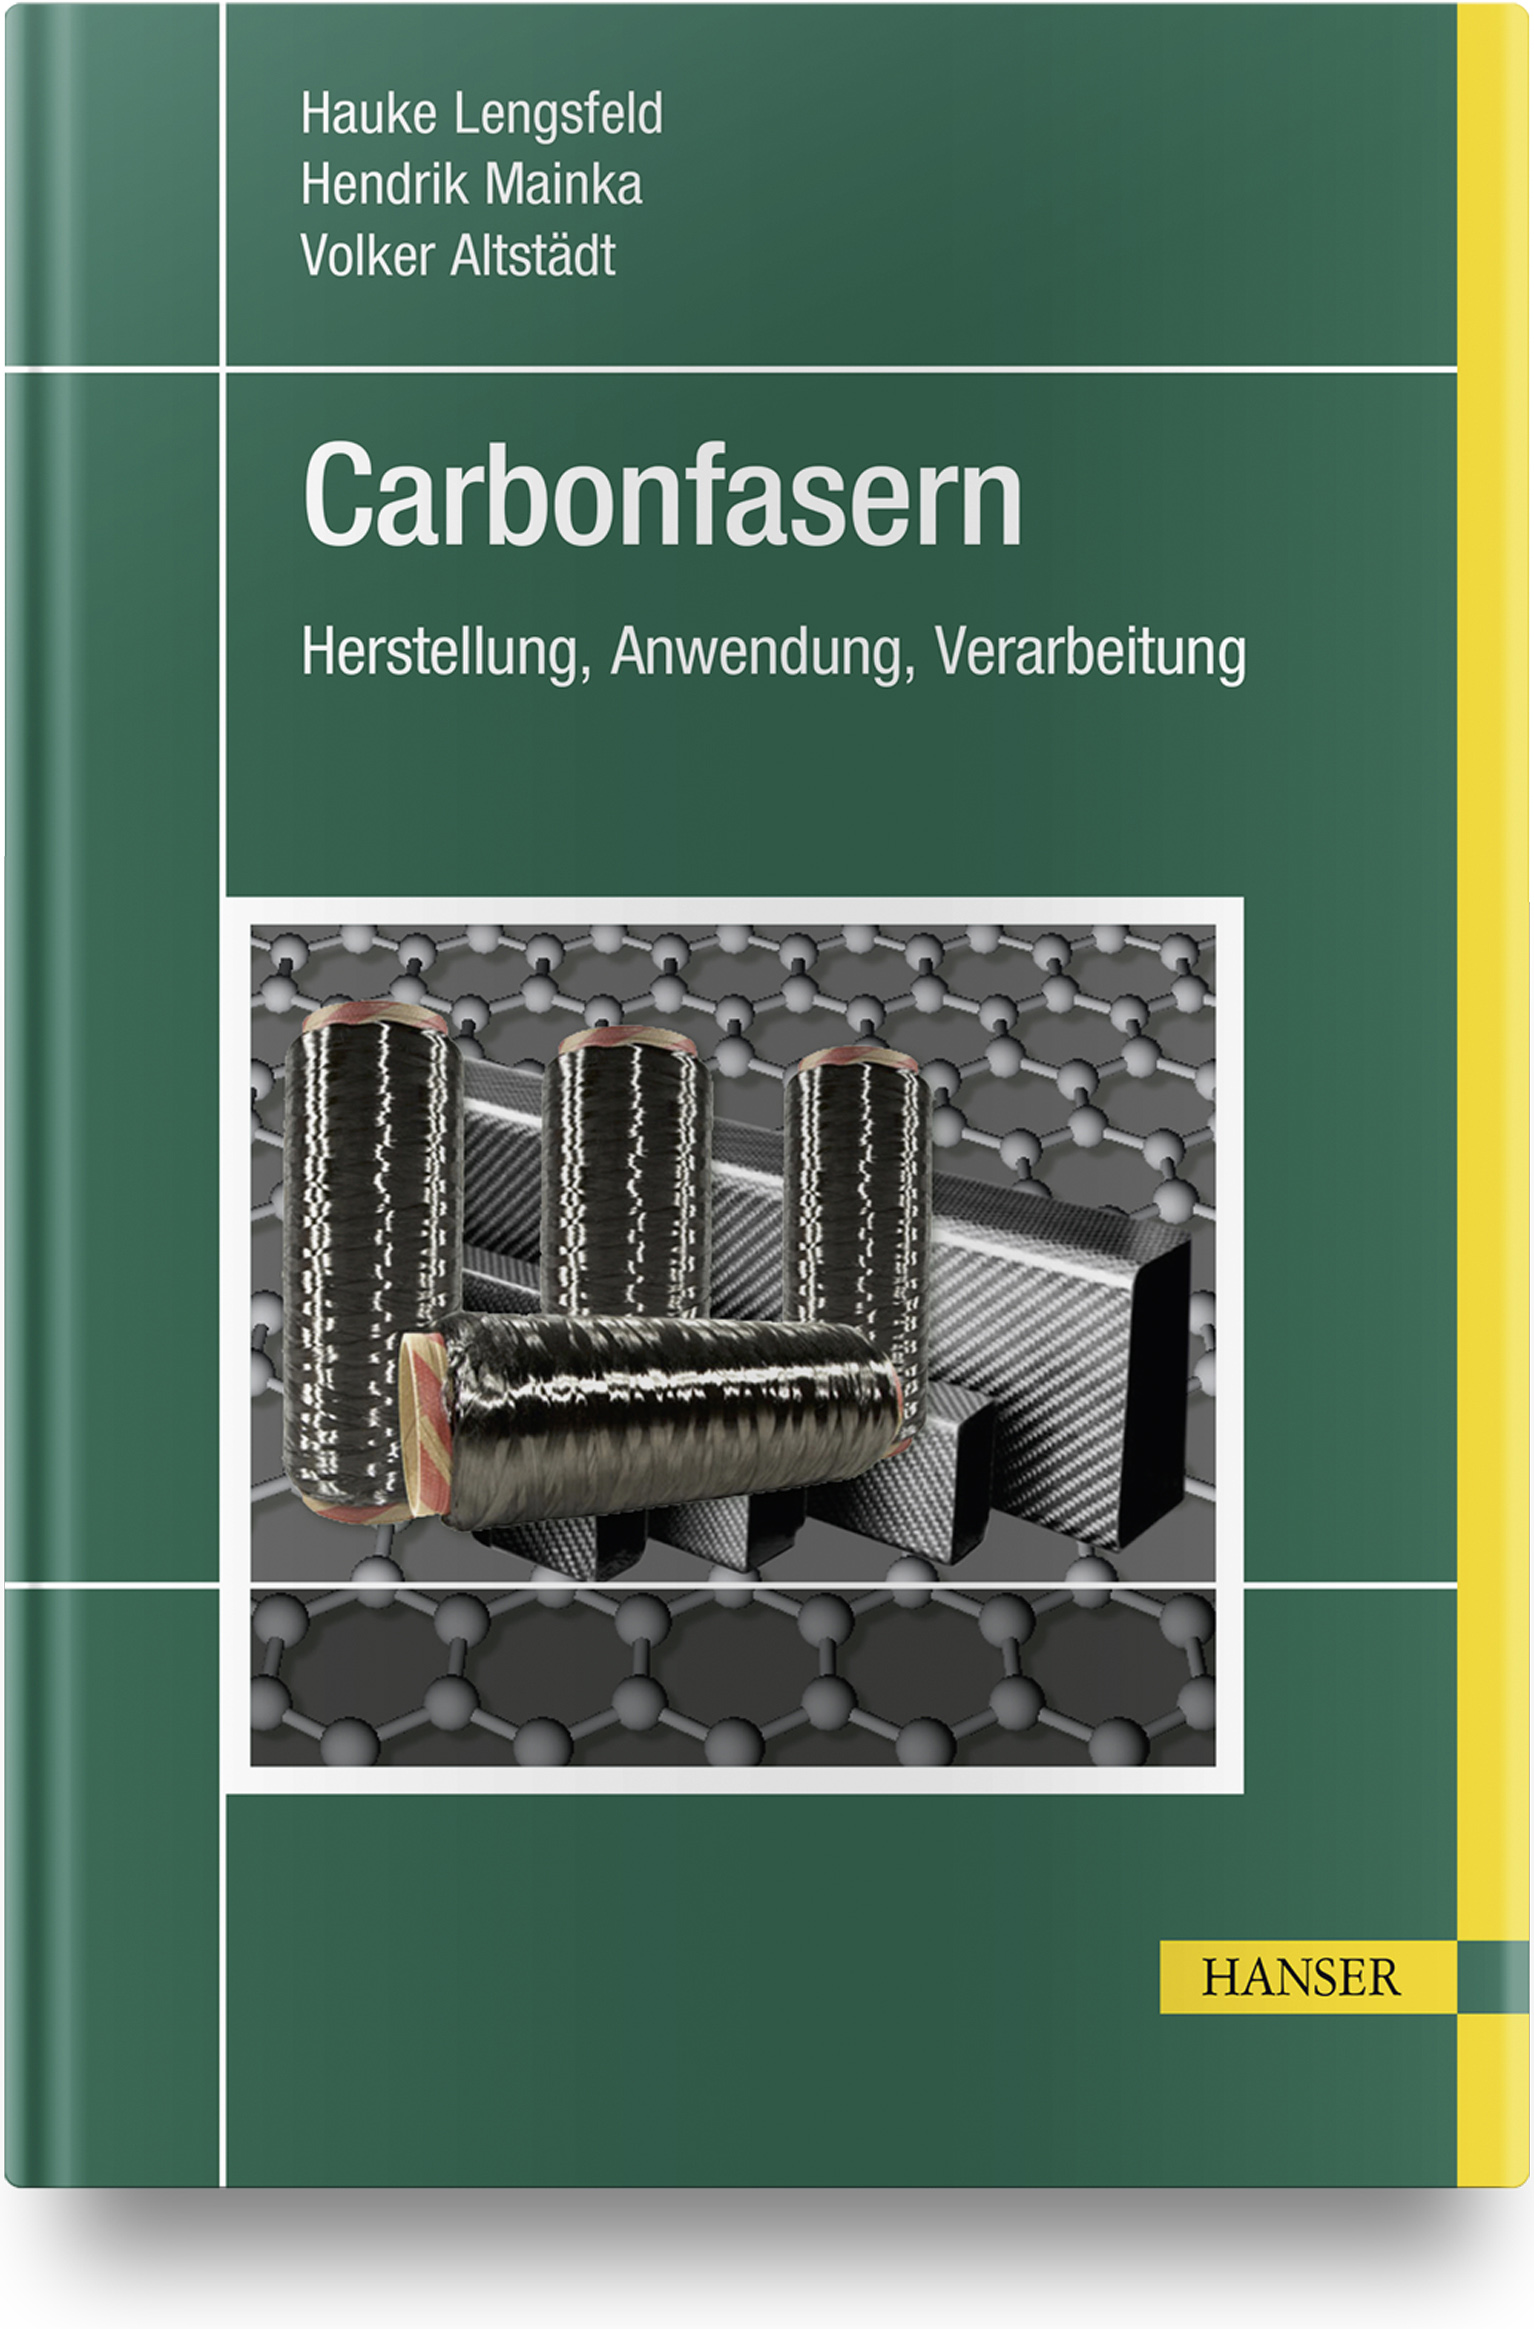 Lengsfeld, Mainka, Altstädt, Carbonfasern, 978-3-446-45407-1